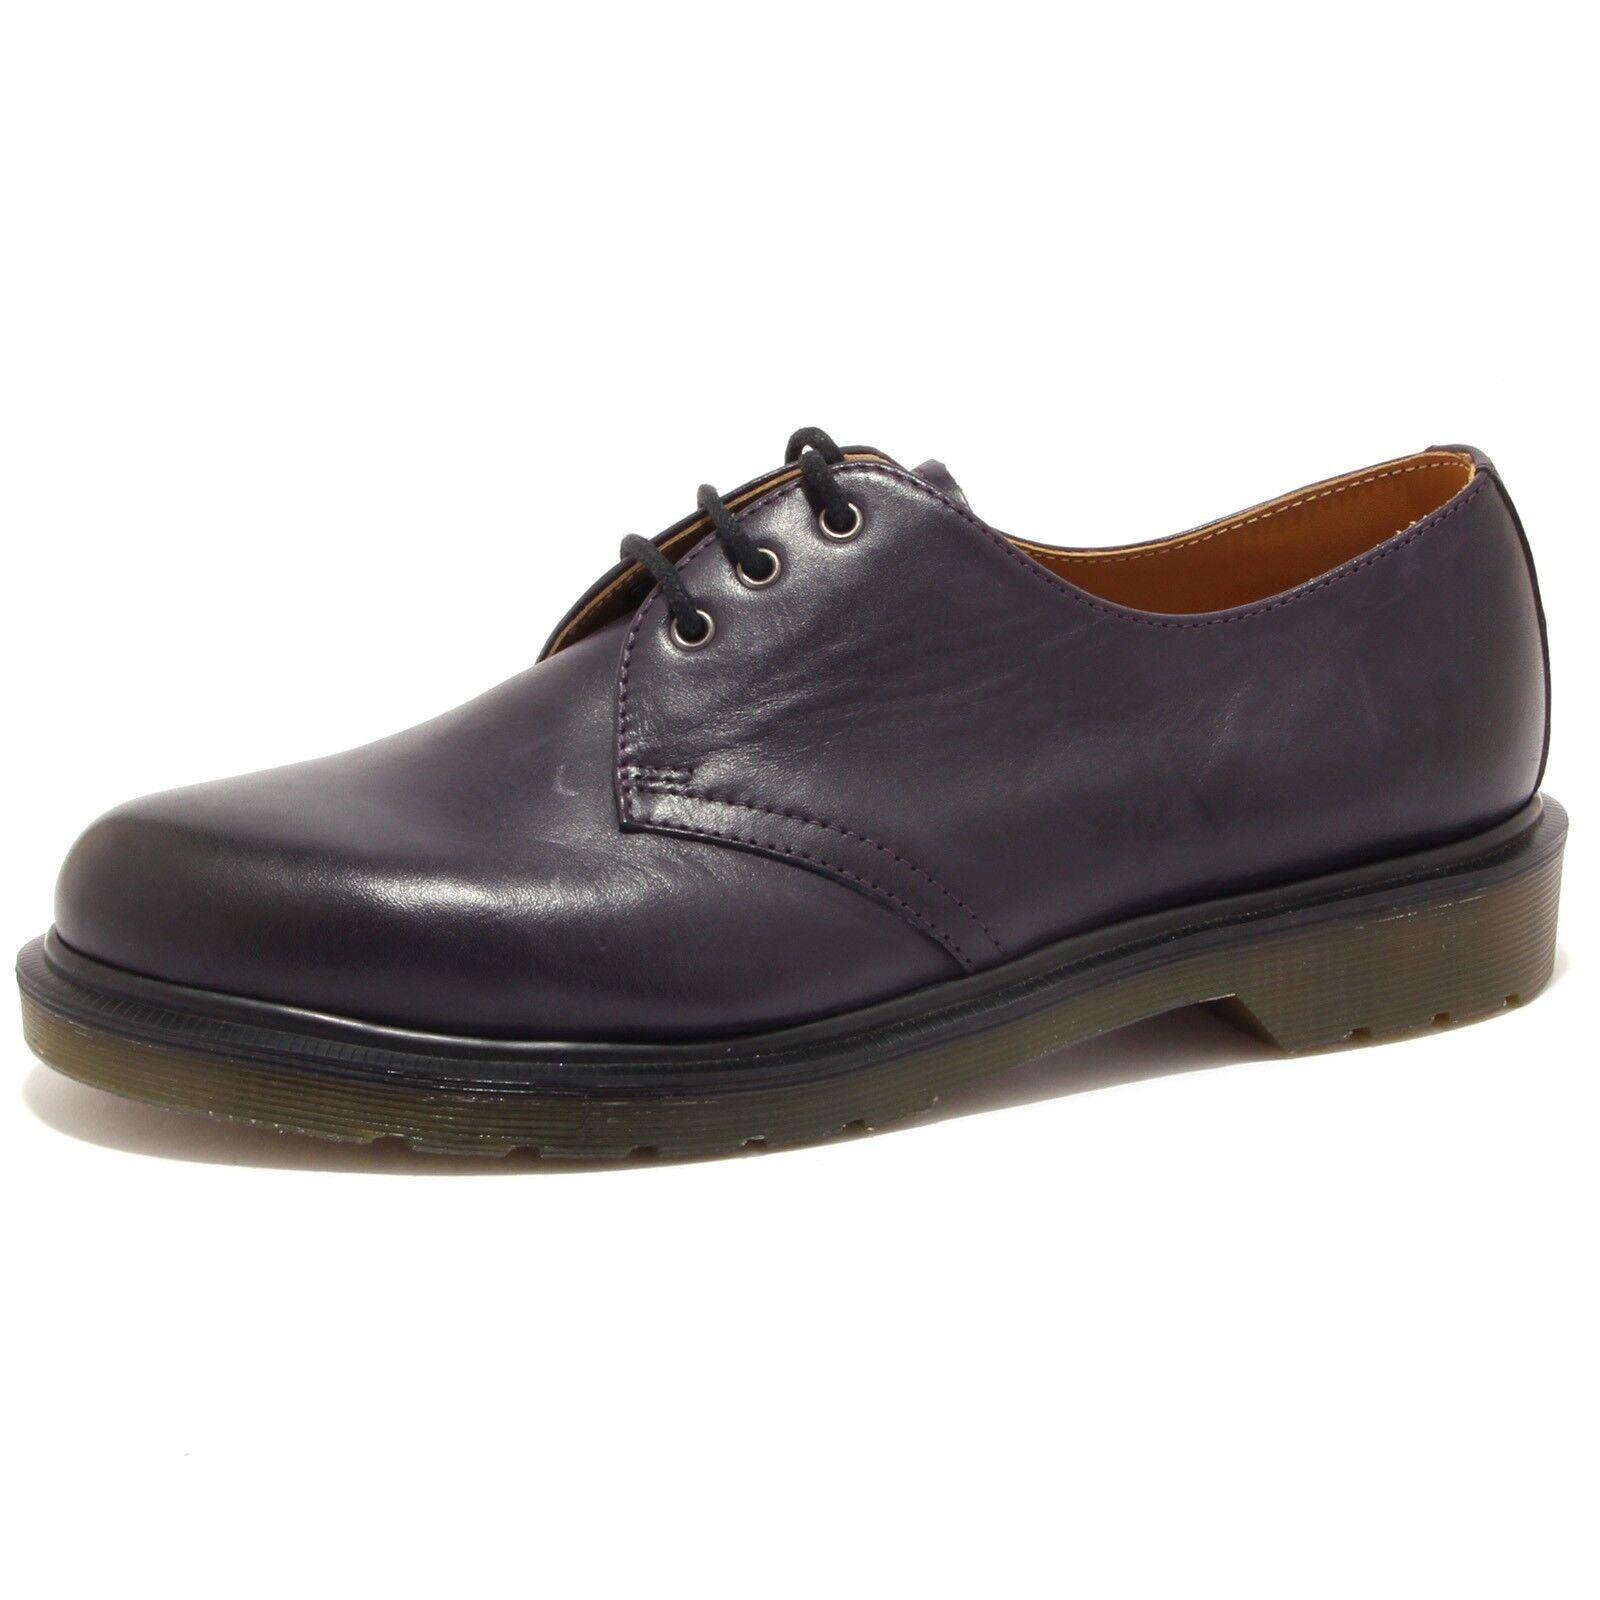 6984U (without box) viola zapatos hombre DR. MARTENS viola box) zapatos Hombre 8adb74